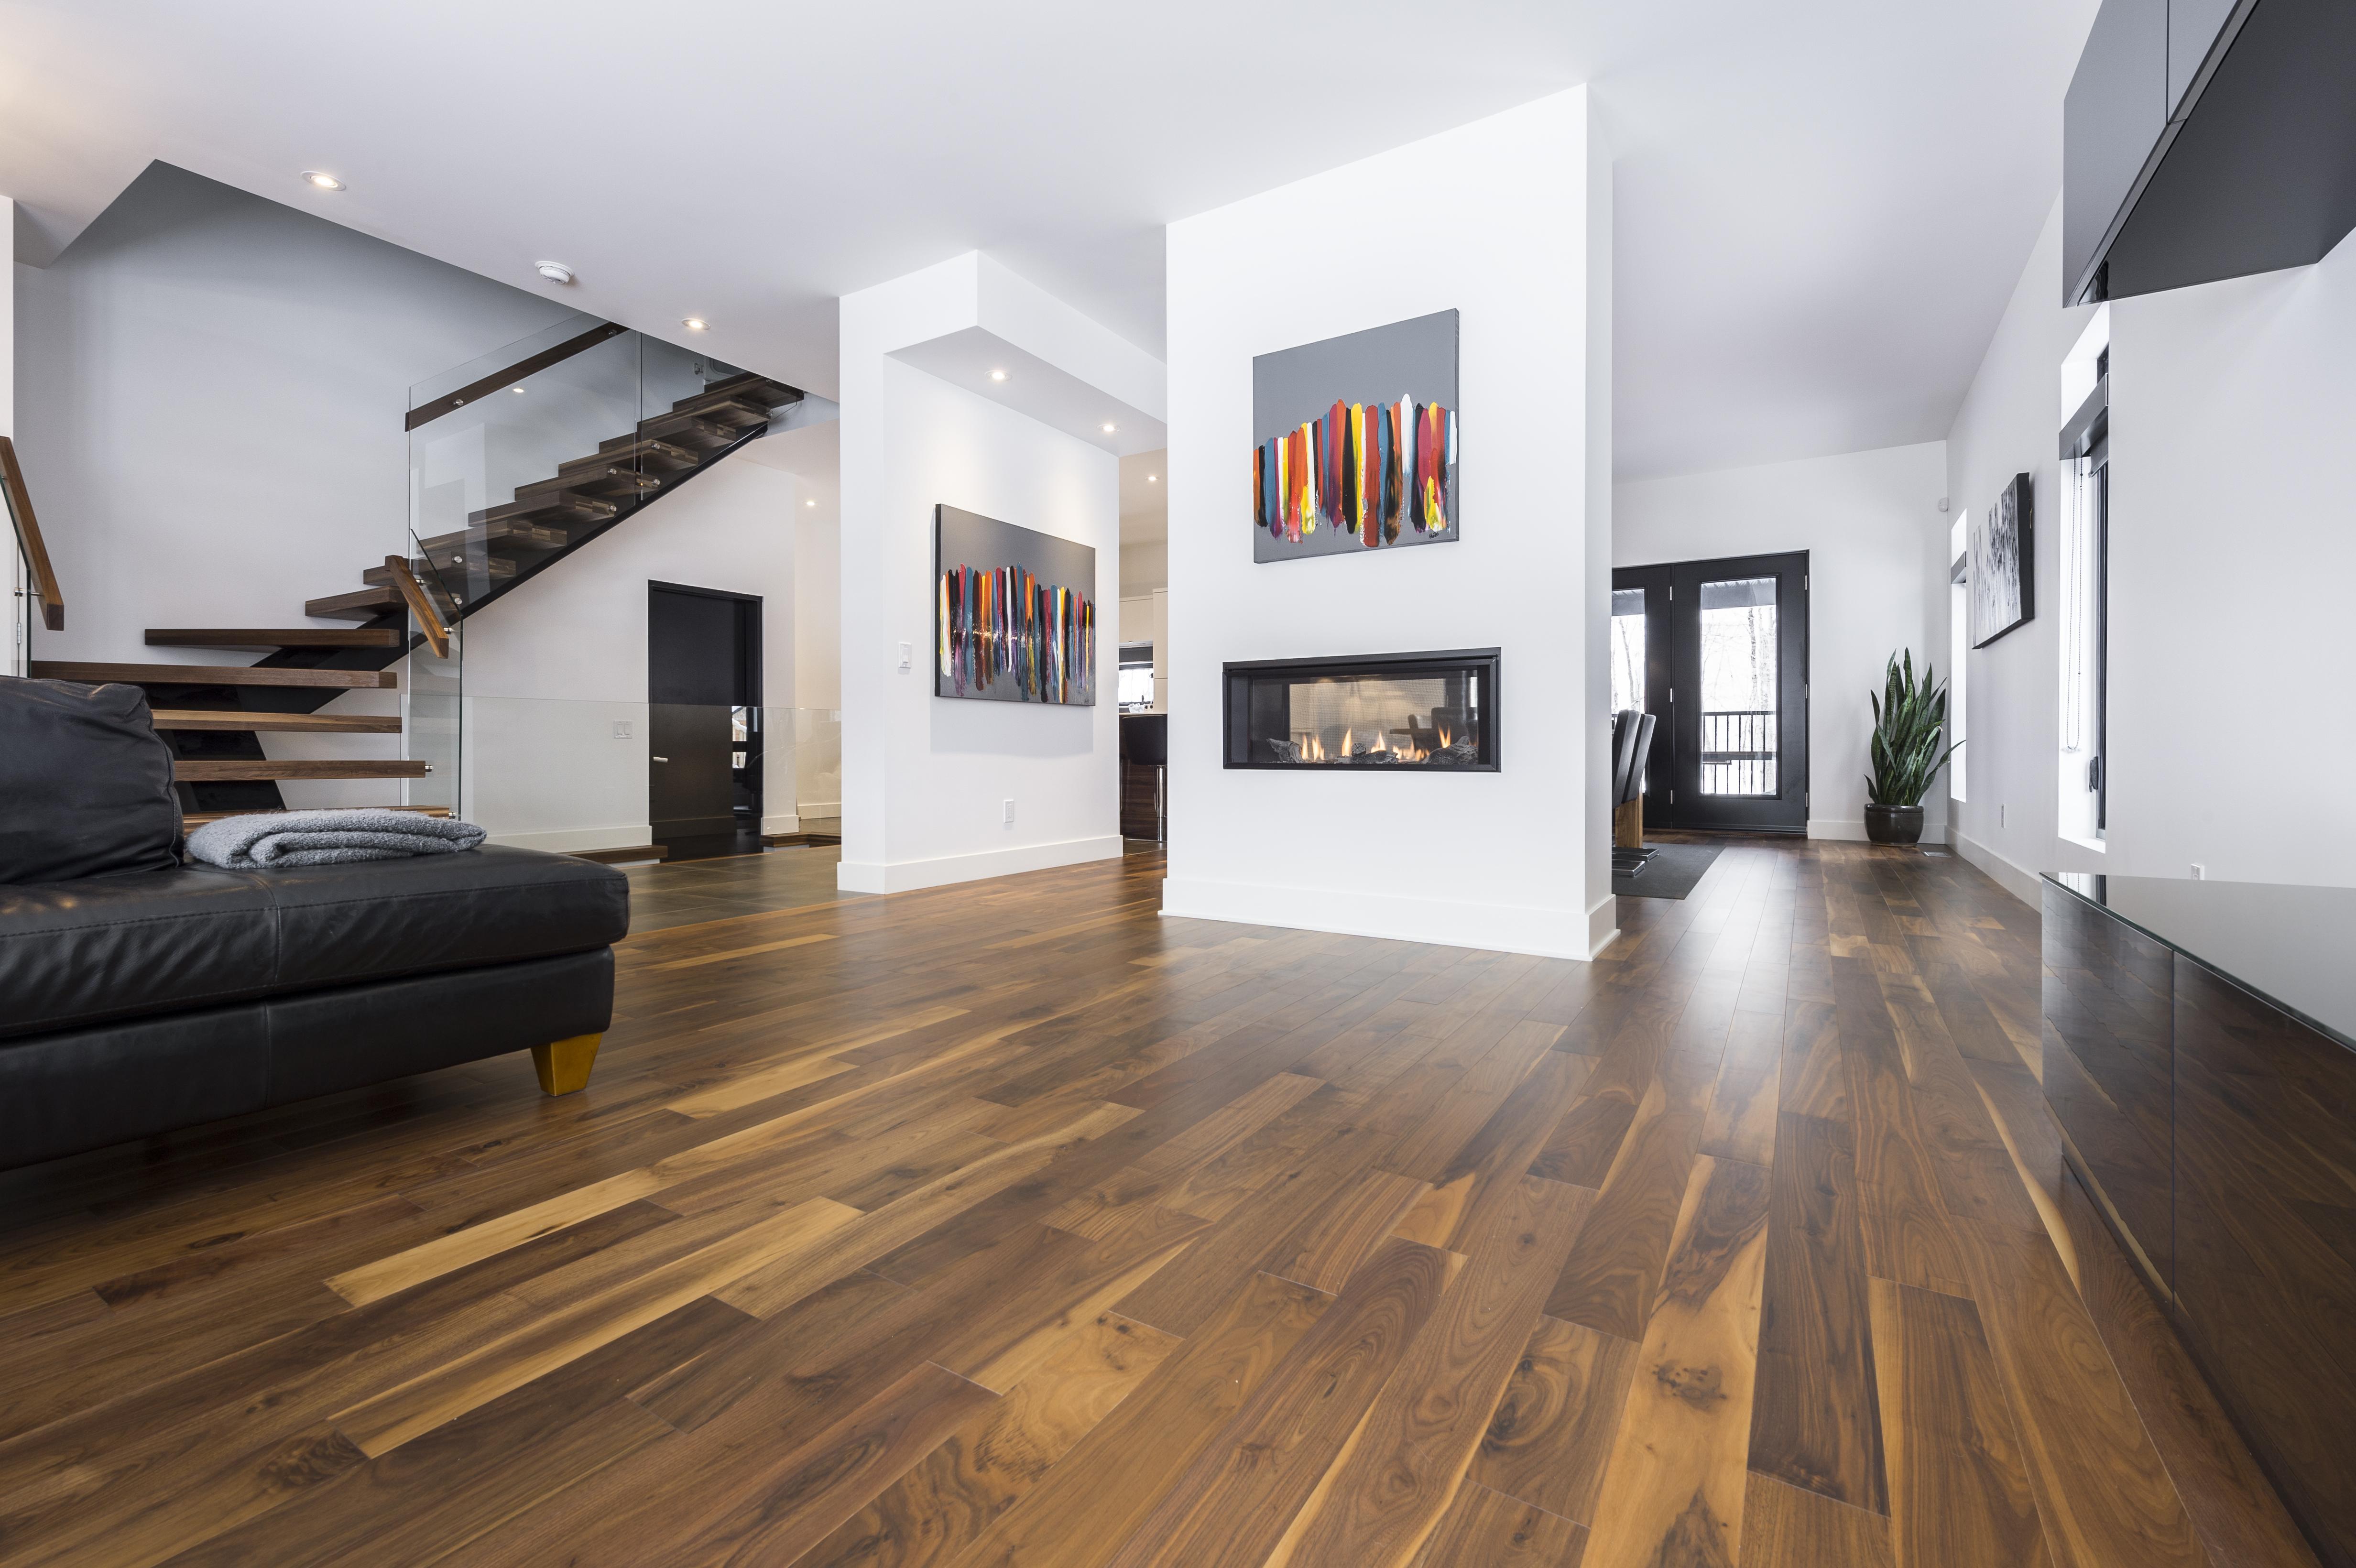 bois franc myrador. Black Bedroom Furniture Sets. Home Design Ideas